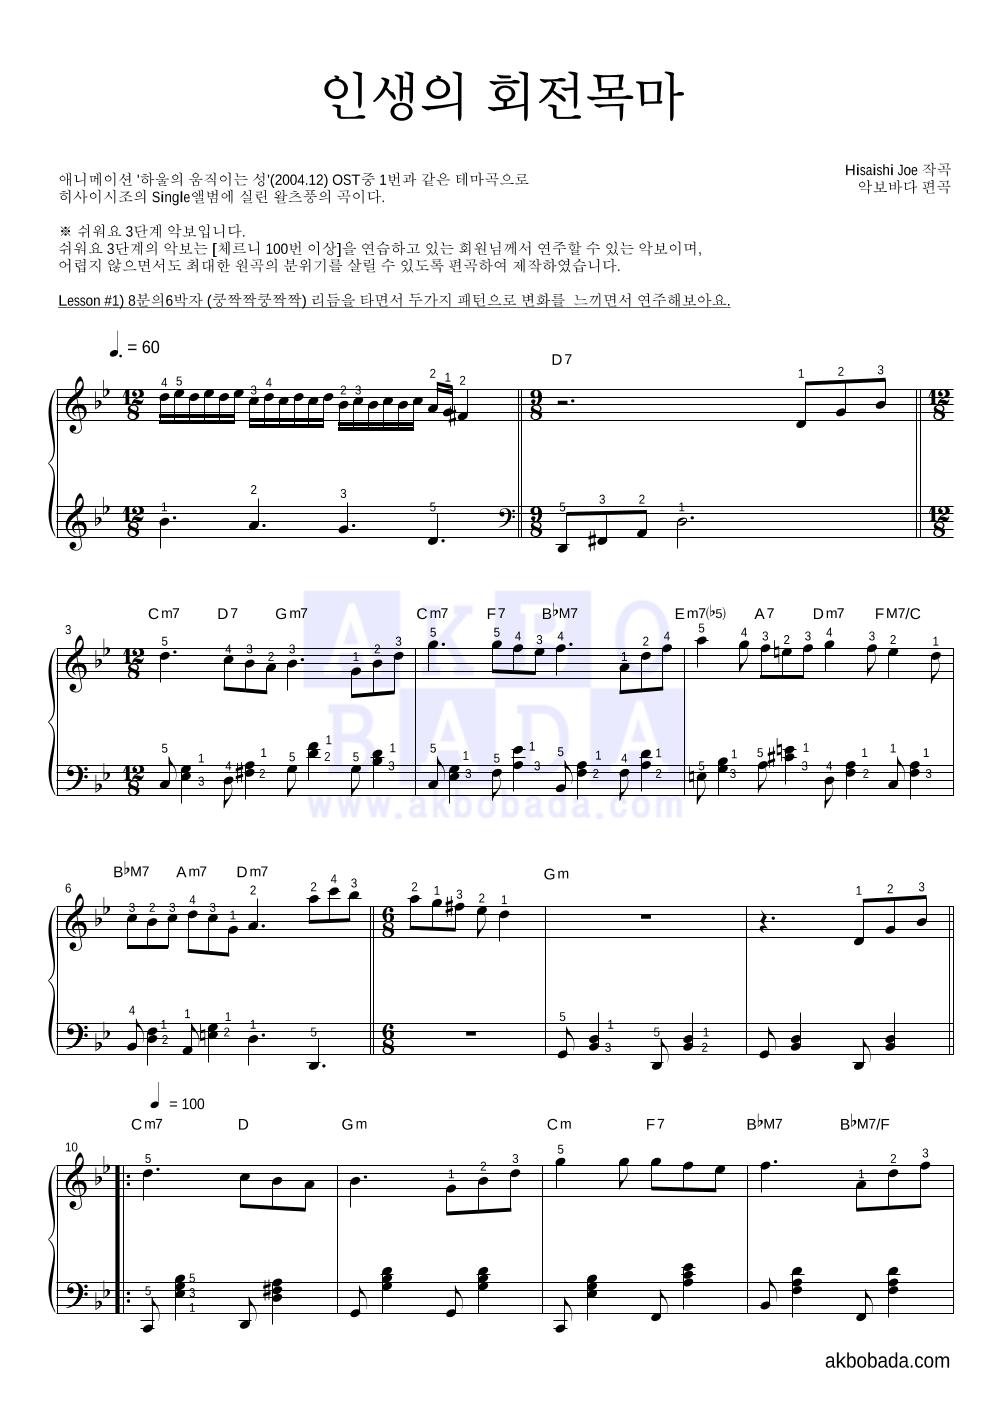 Hisaishi Joe - 인생의 회전목마 피아노2단-쉬워요 악보